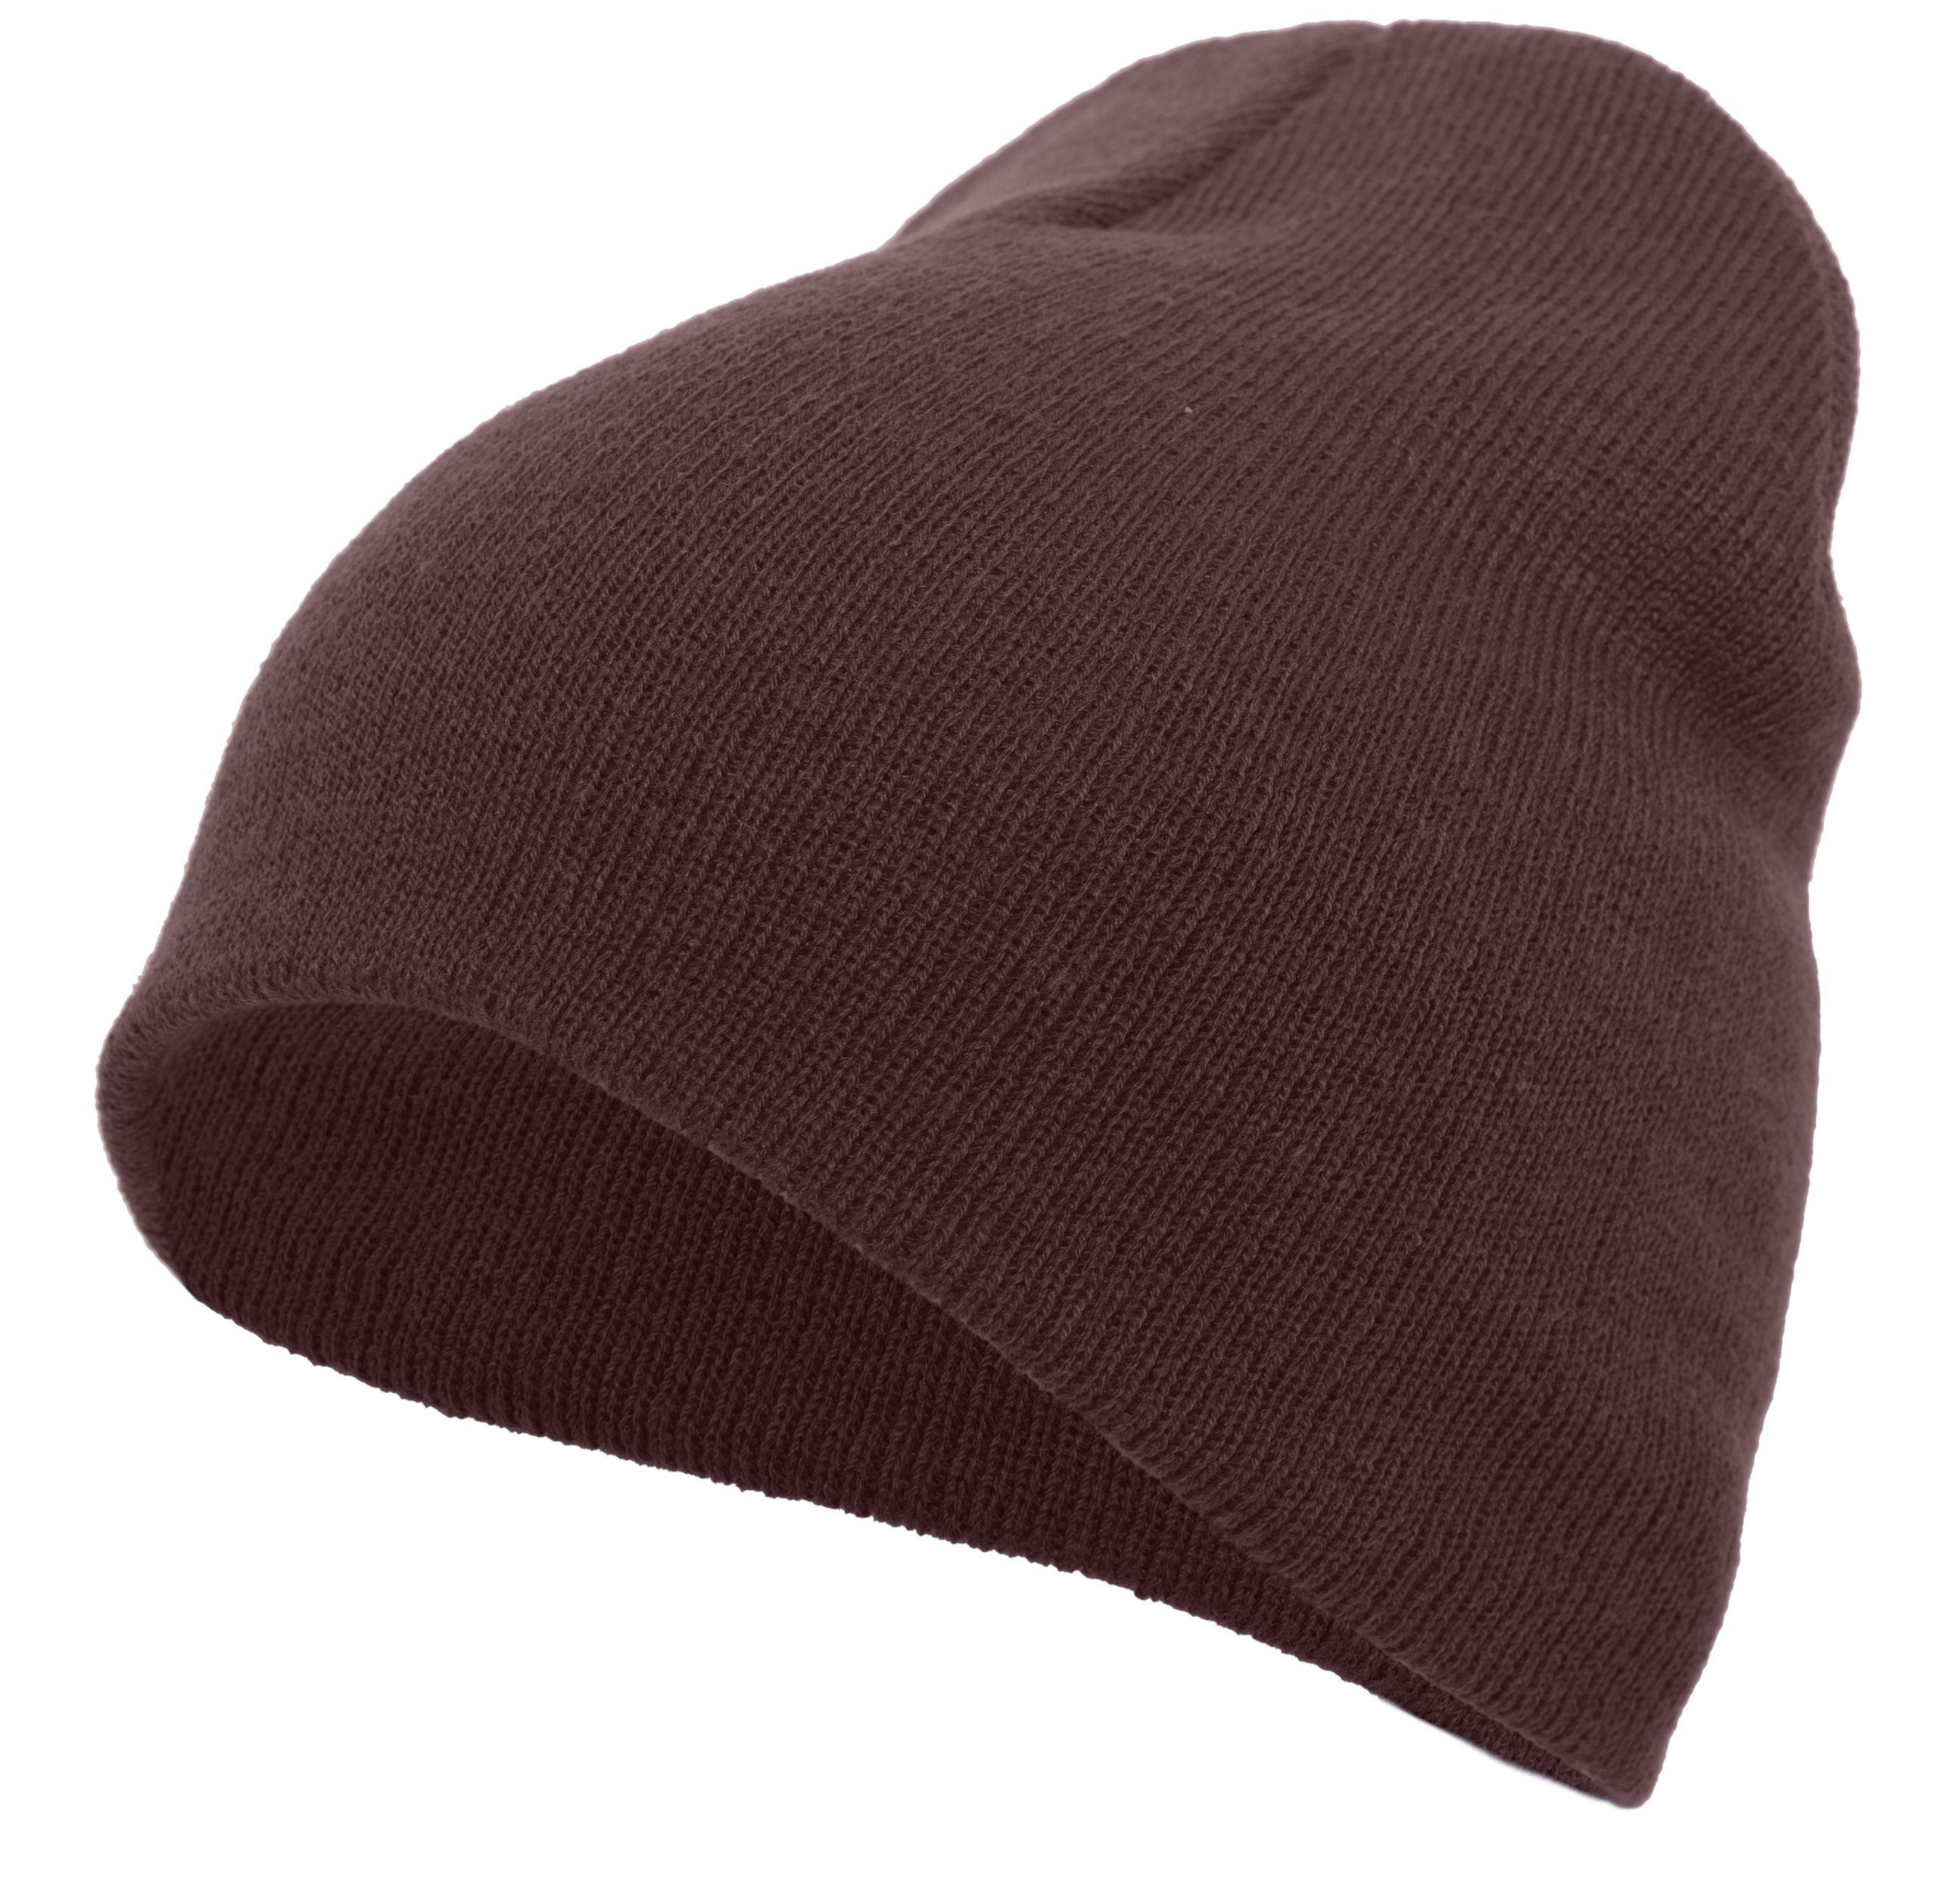 Basic Knit Beanie - MAROON